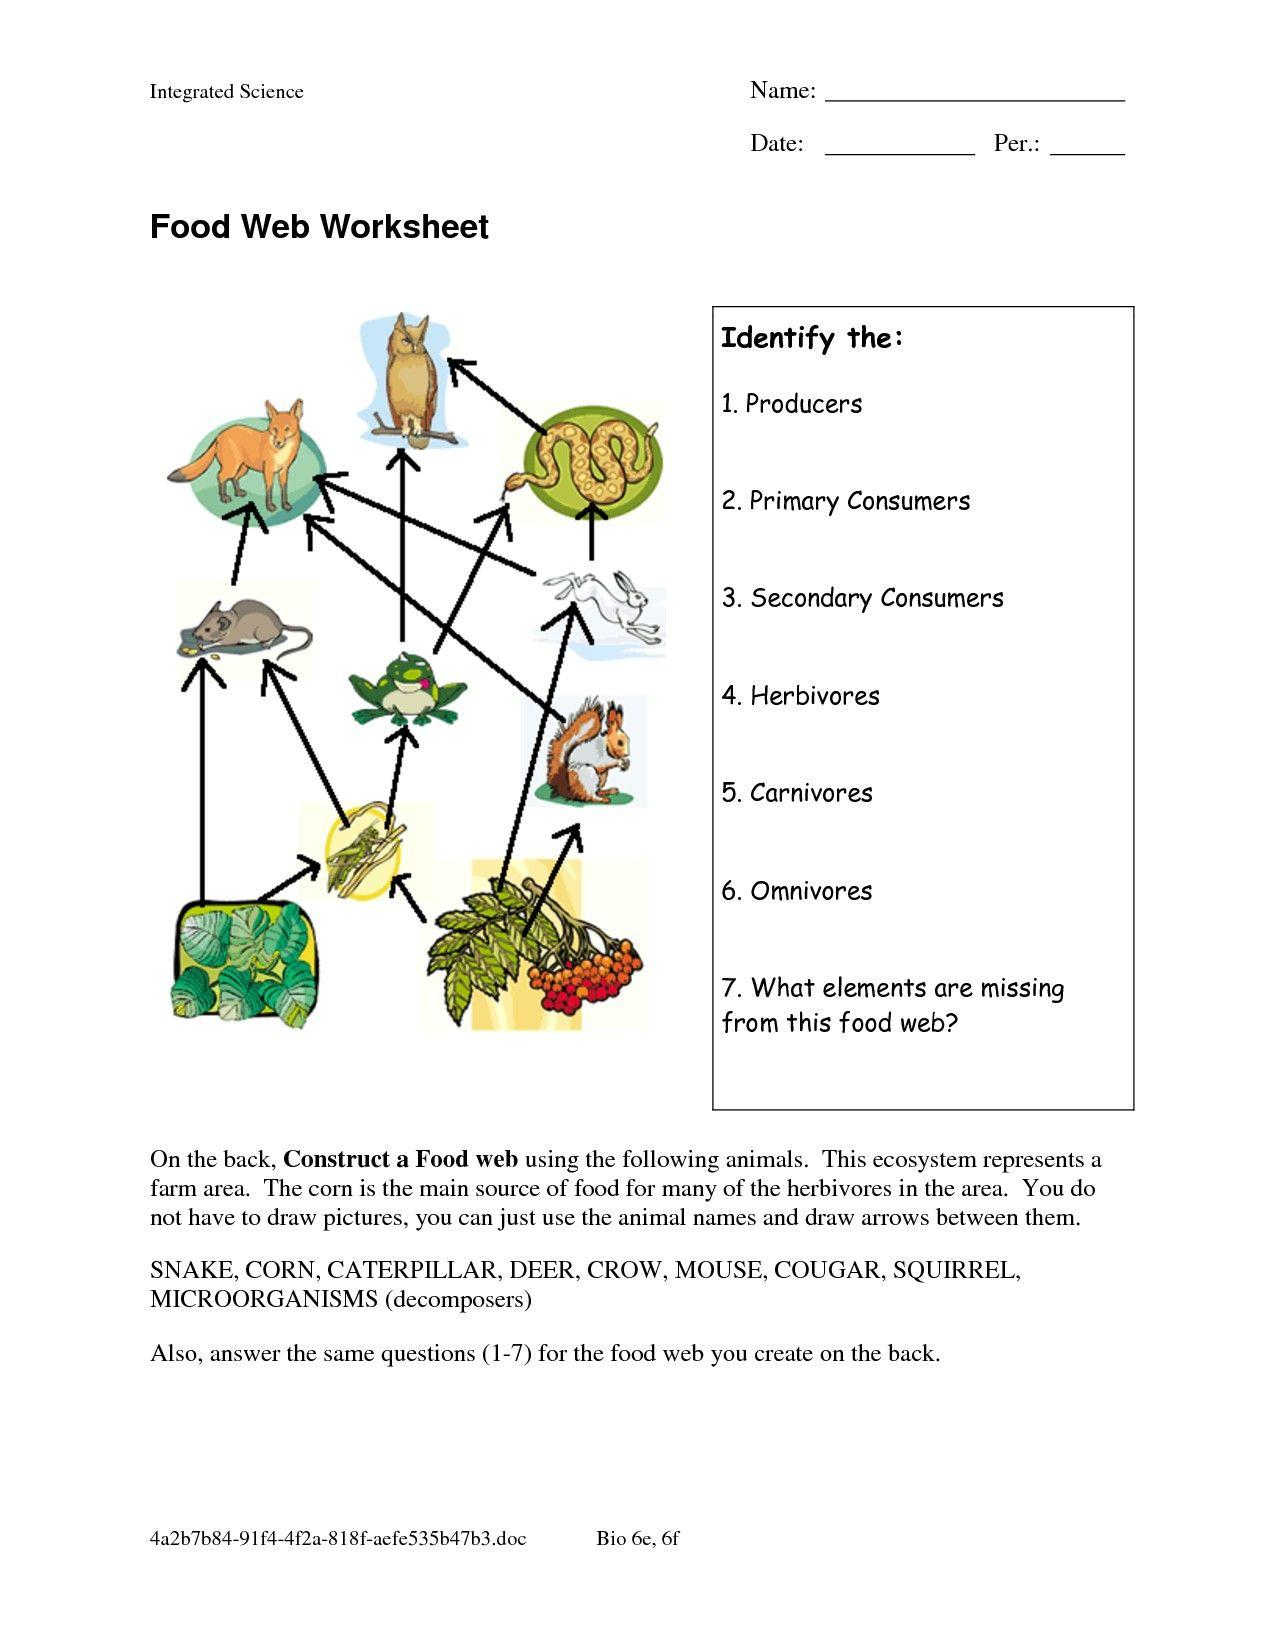 10 Prime Flow For The Love Of Water Worksheet Di